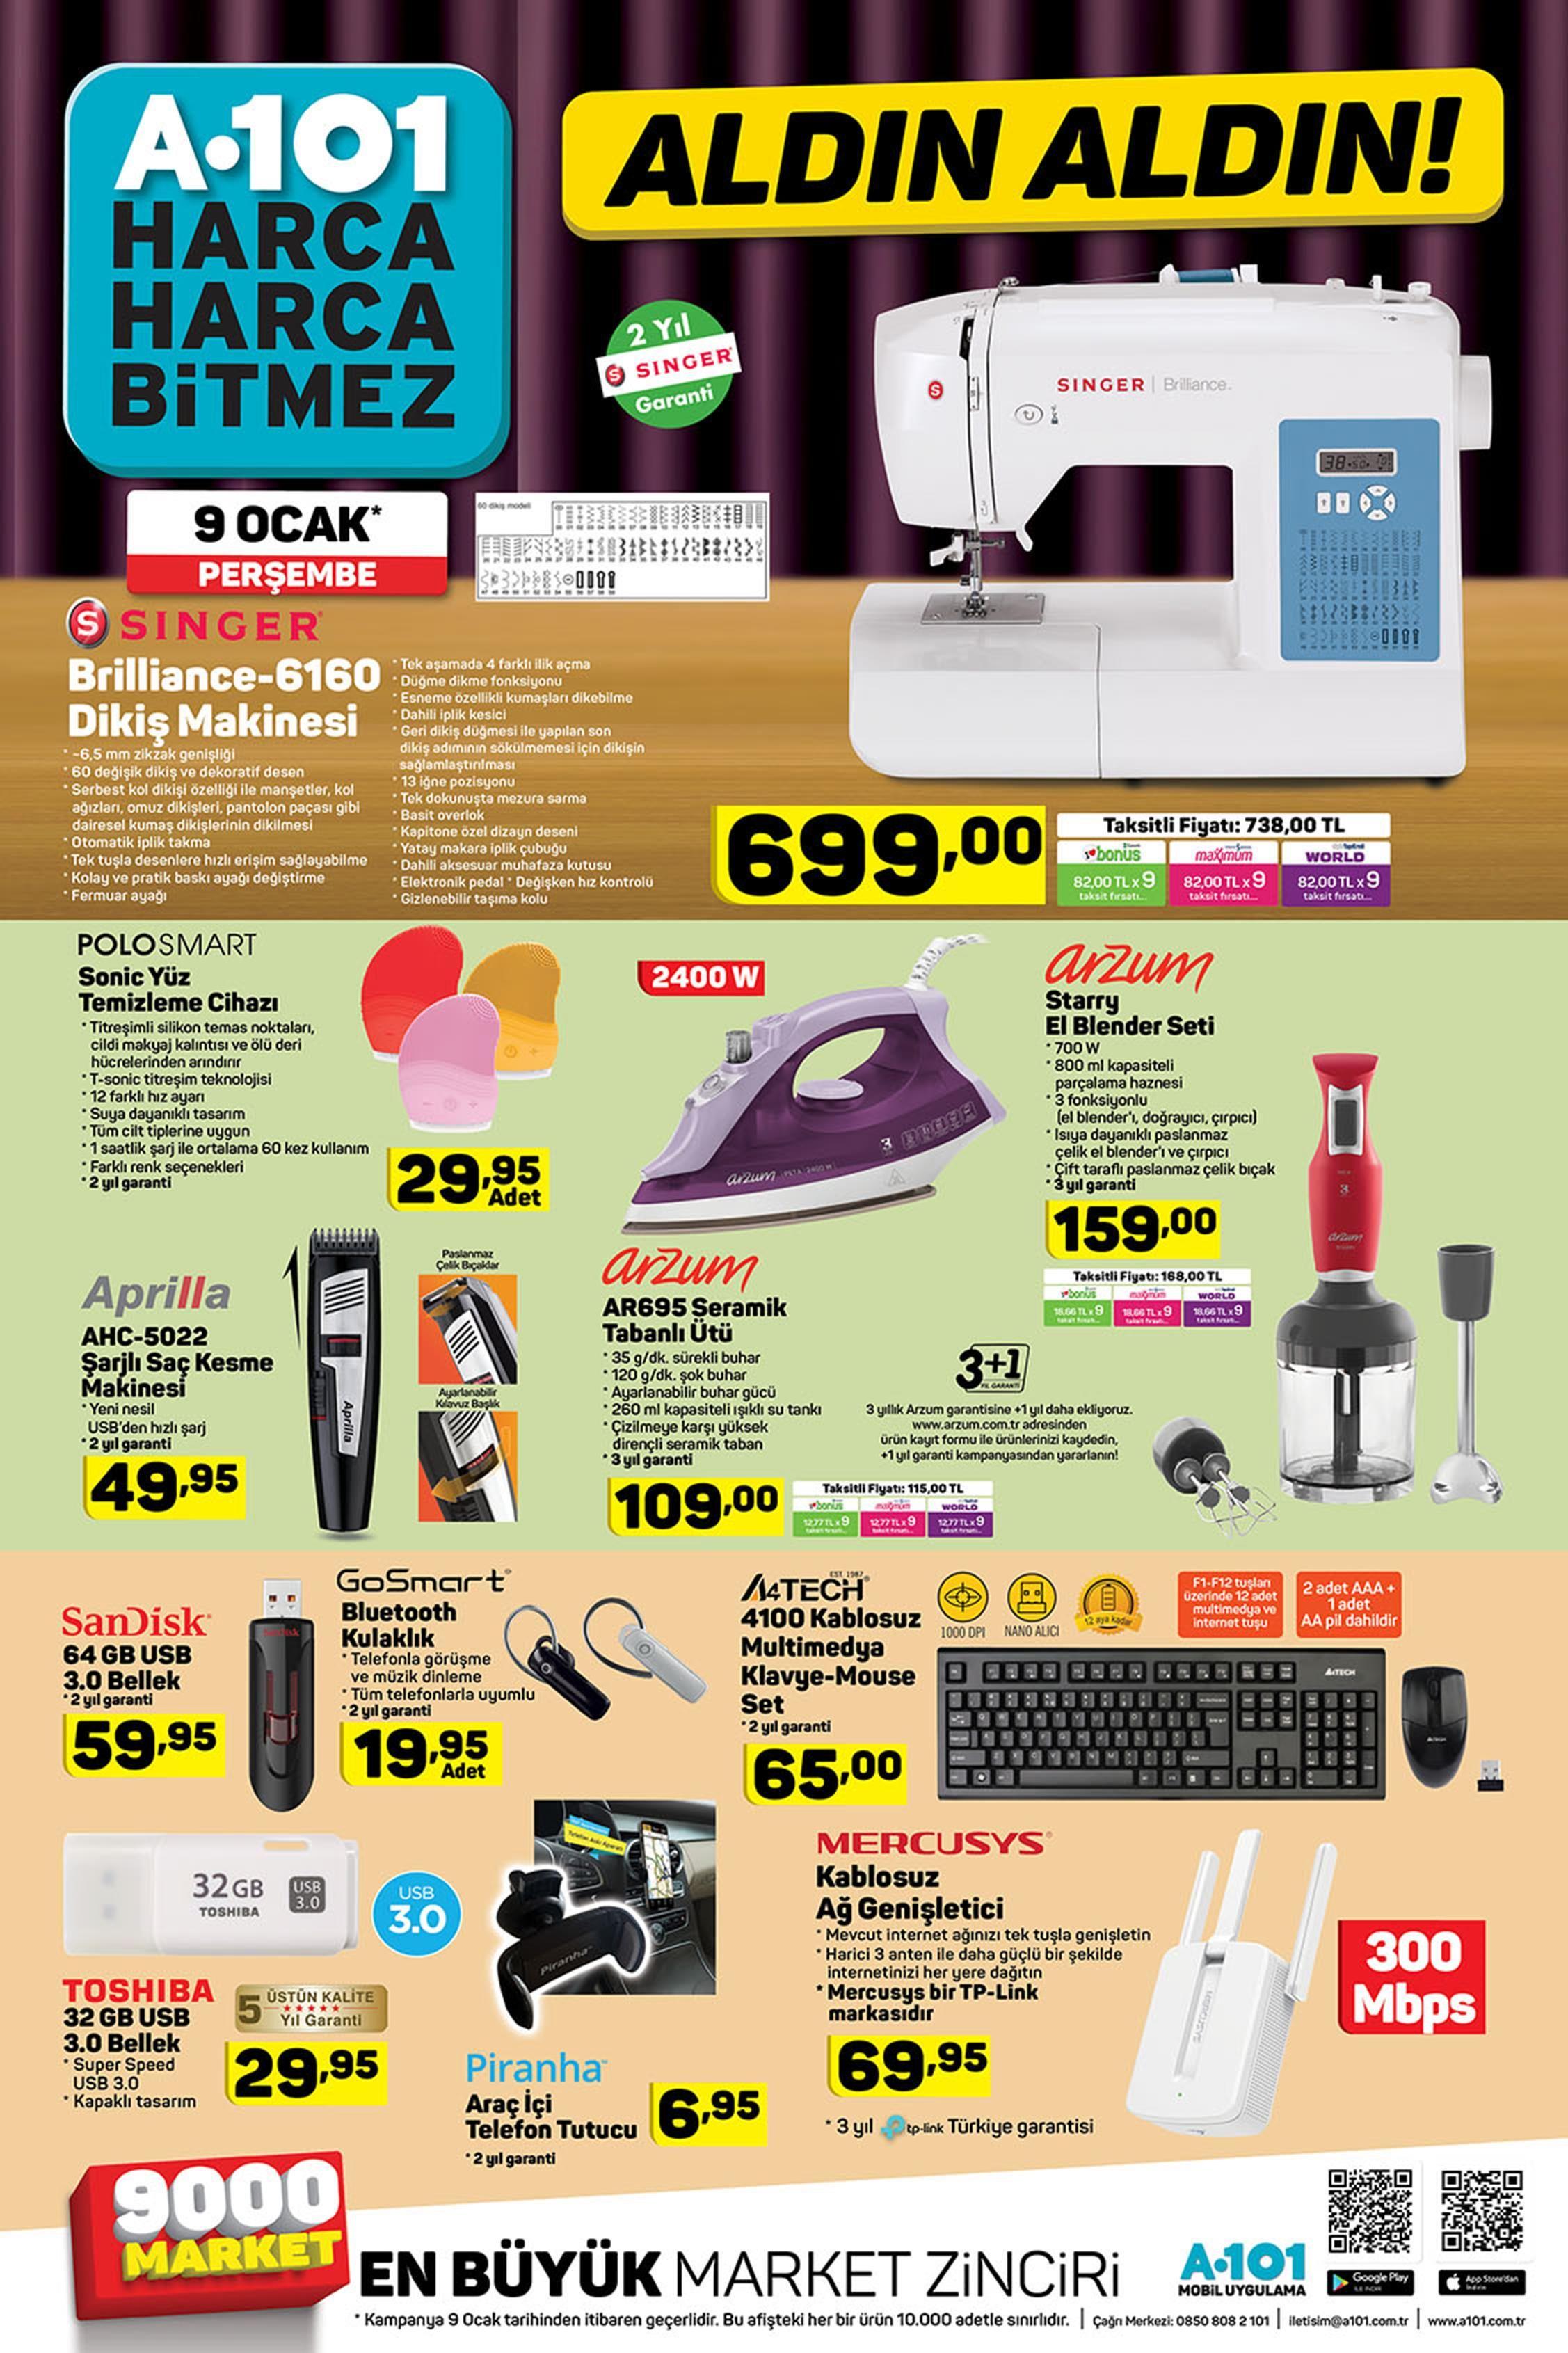 A101 Aktuel Urunler Gelecek A101 Katalogu In 2020 Singer Blender Shopping